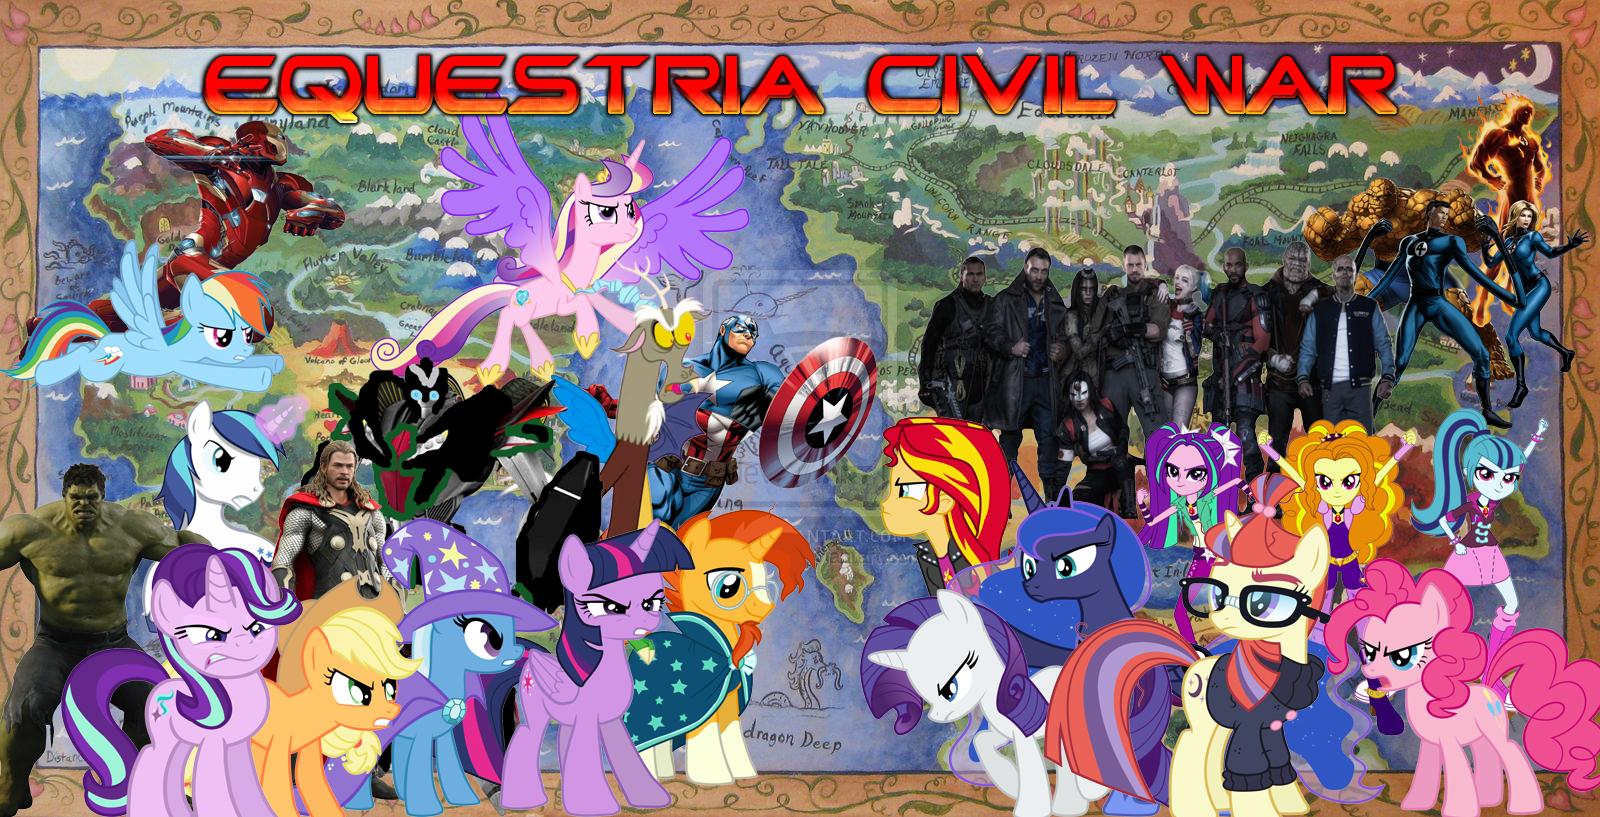 Equestria Civil War Poohs Adventures Wiki Fandom Powered By Wikia